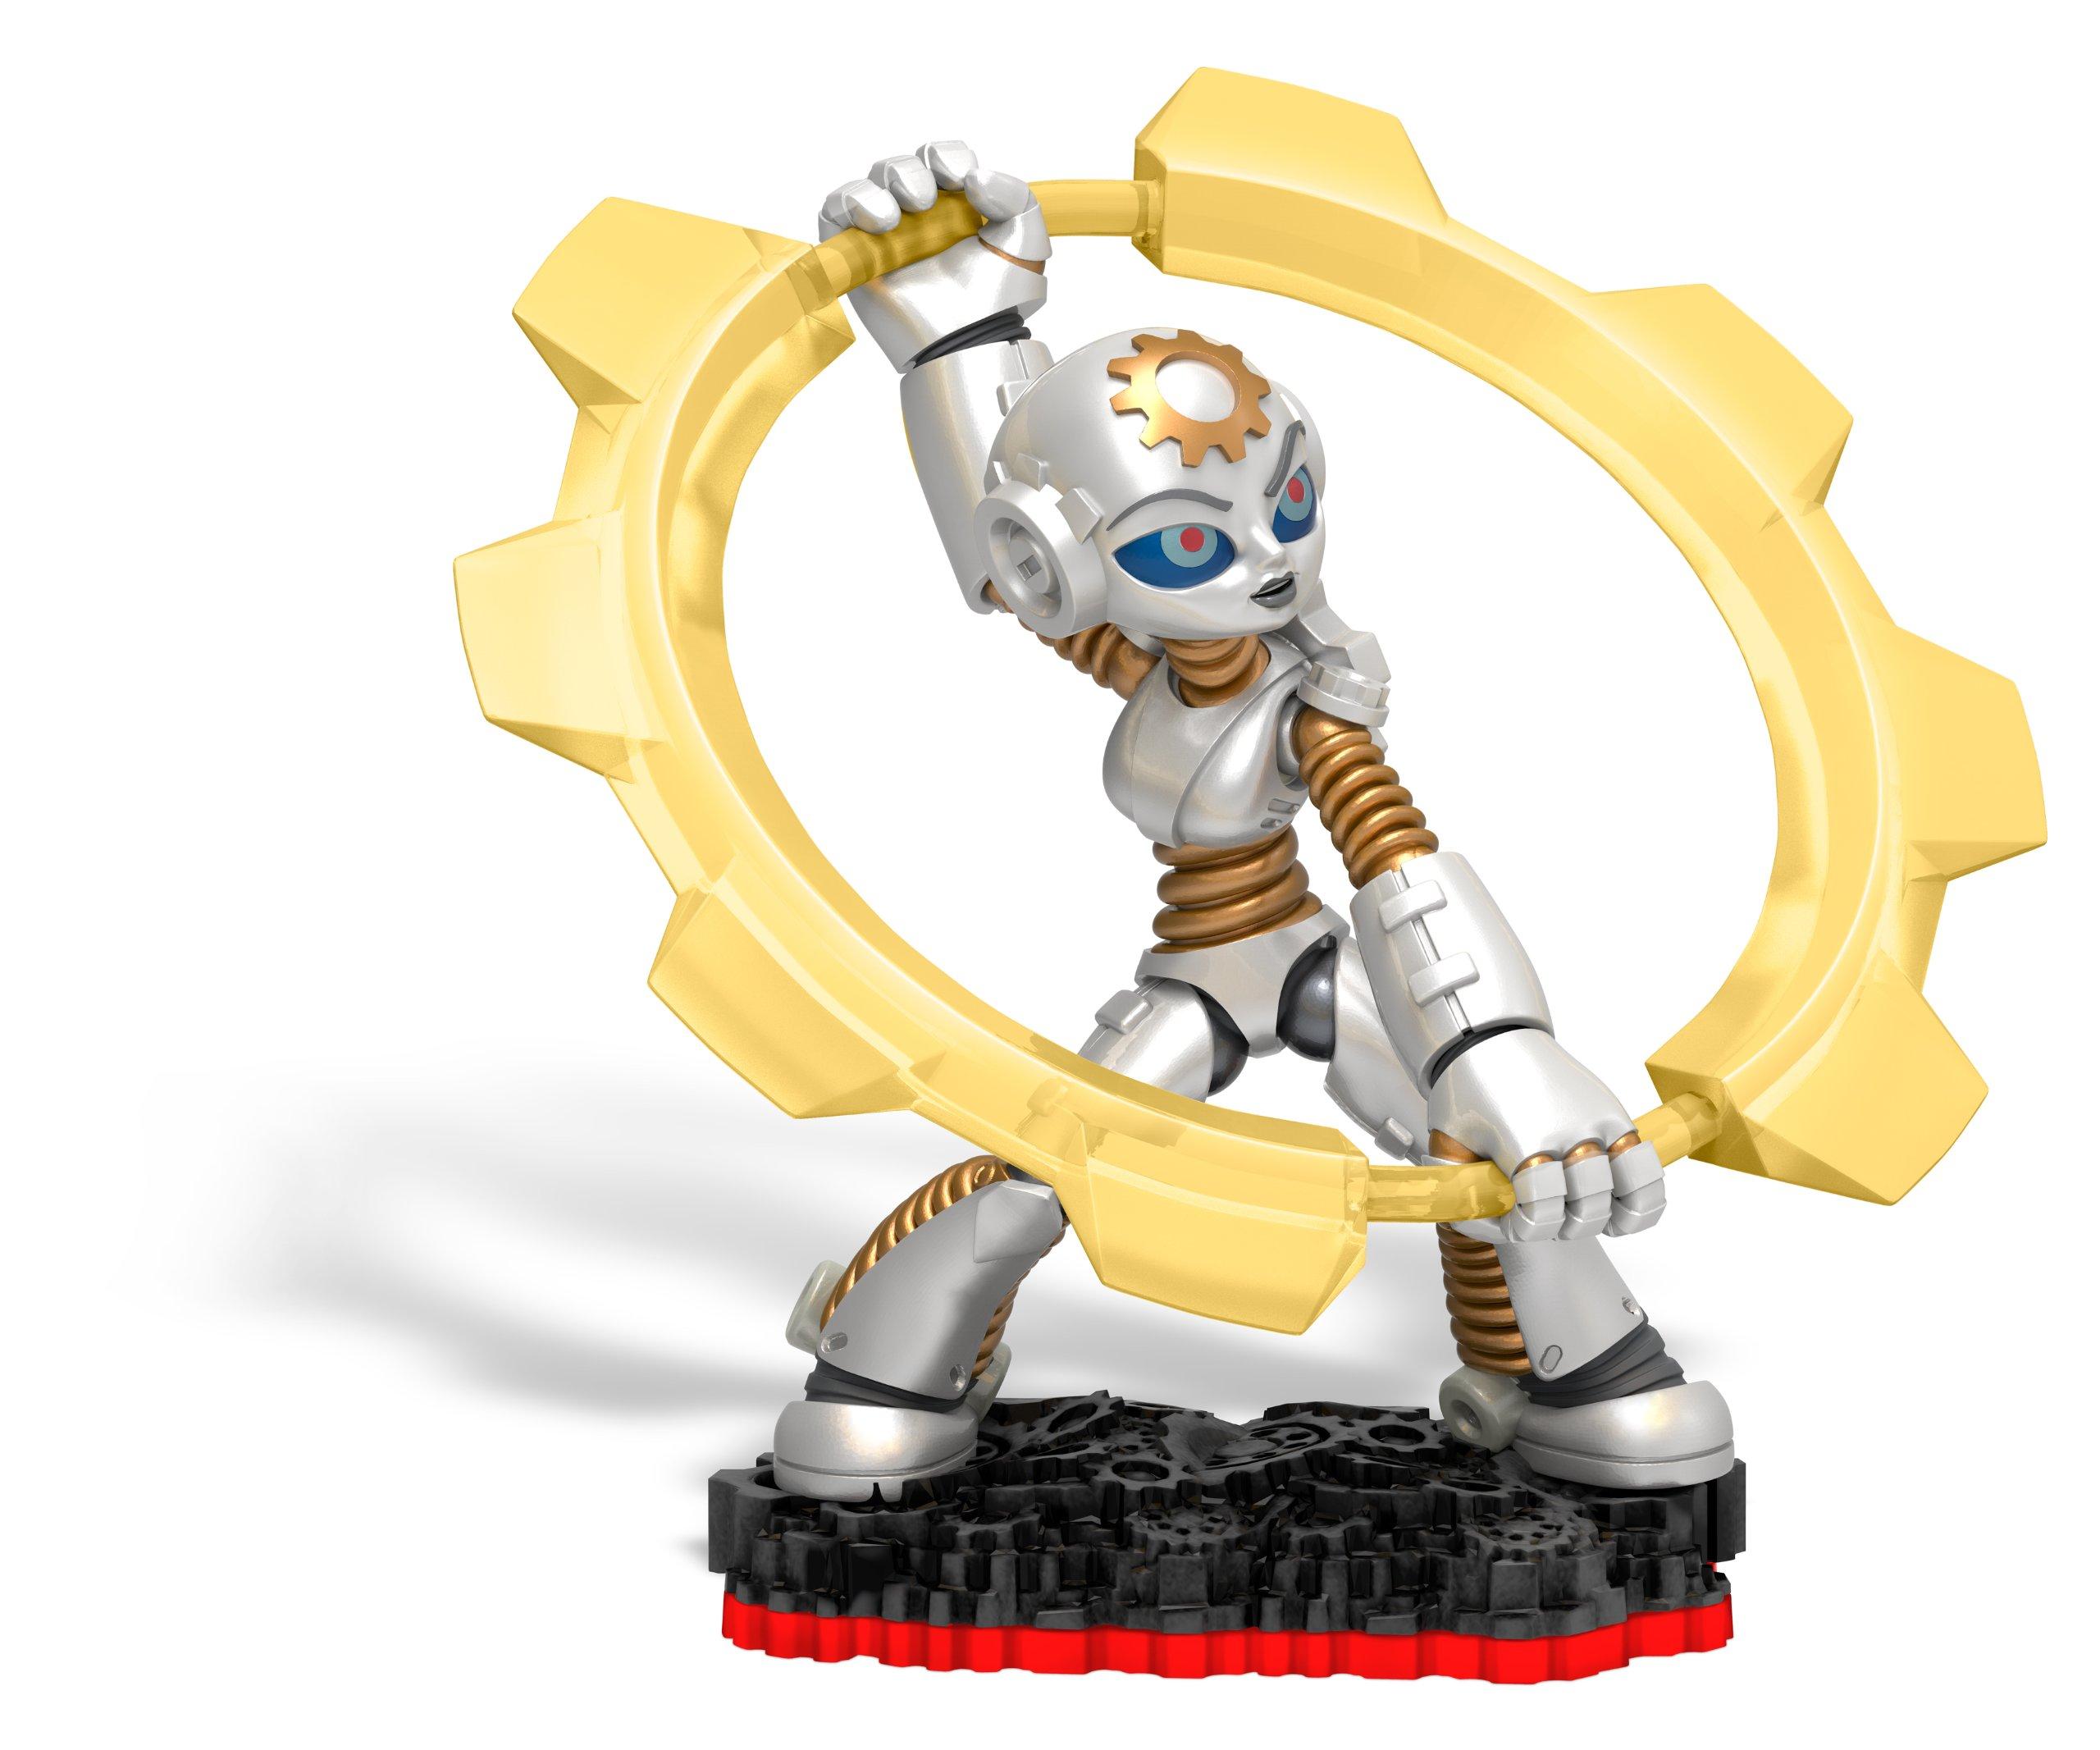 Skylanders Trap Team: Trap Master Gearshift Character Pack